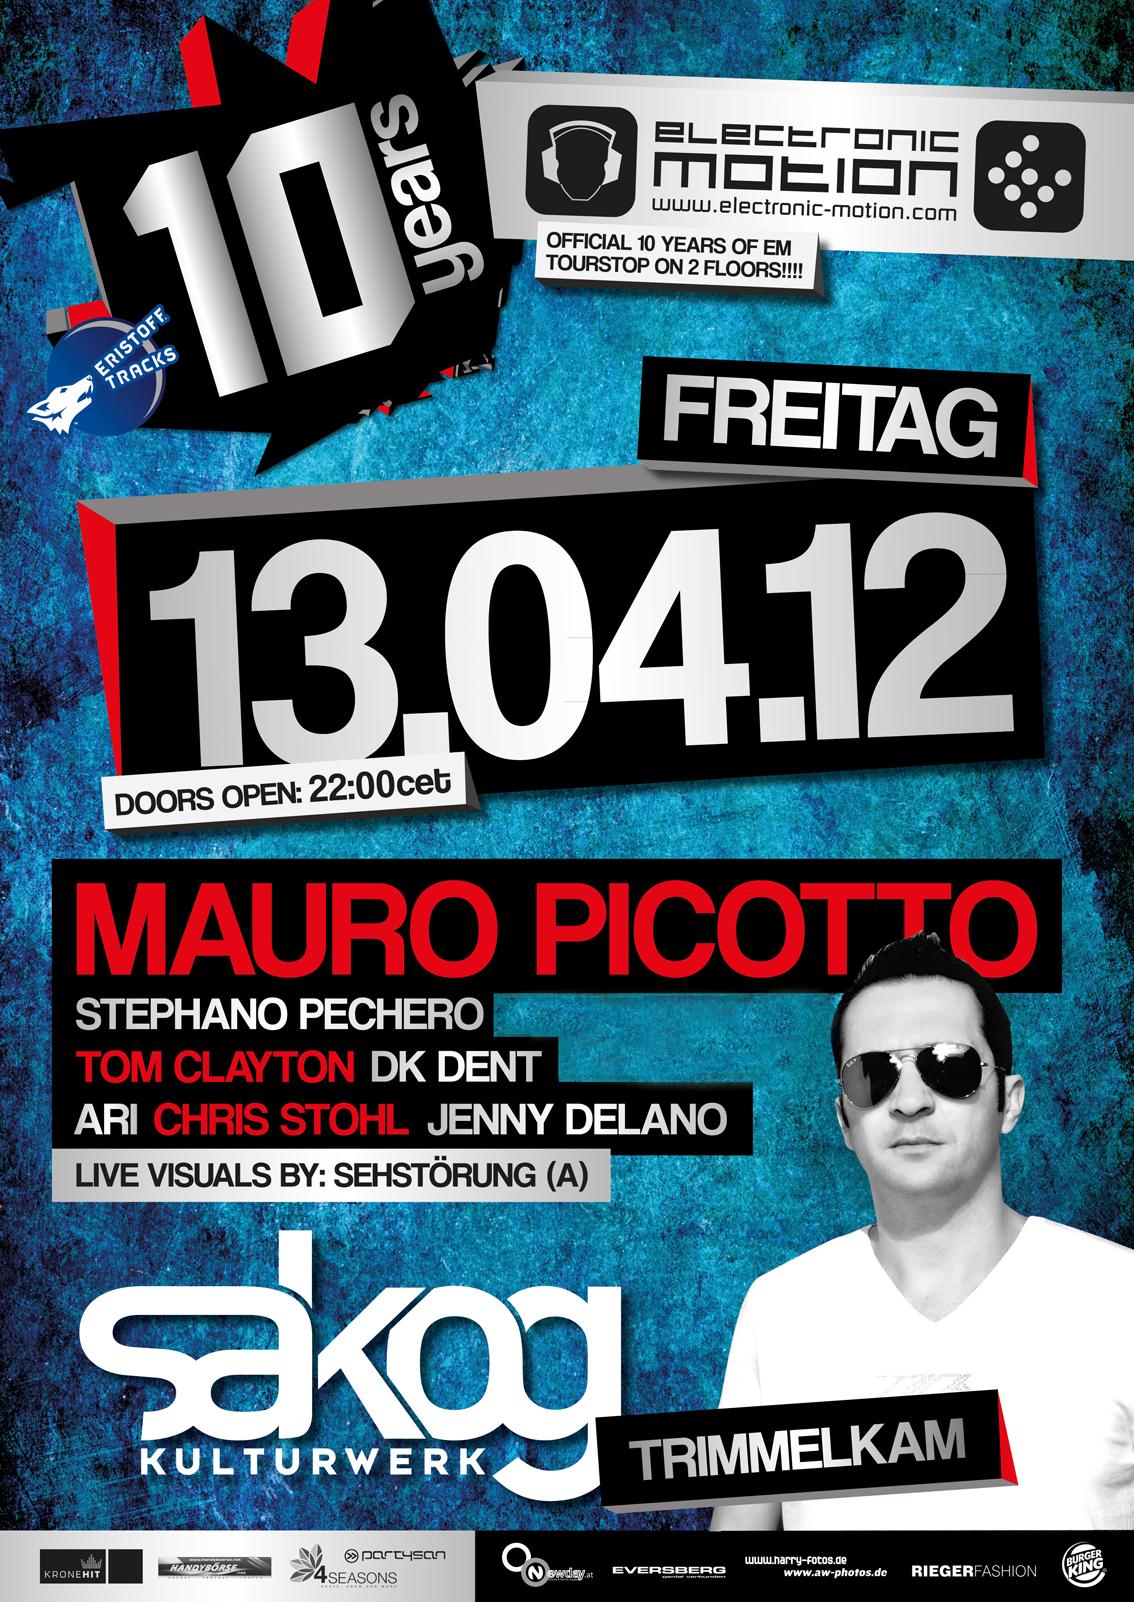 10 JAHRE ELECTRONIC MOTION ÖSTERREICH CLUB TOUR with MAURO PICOTTO, 13.04.2012 @ Sakog Trimmelkam